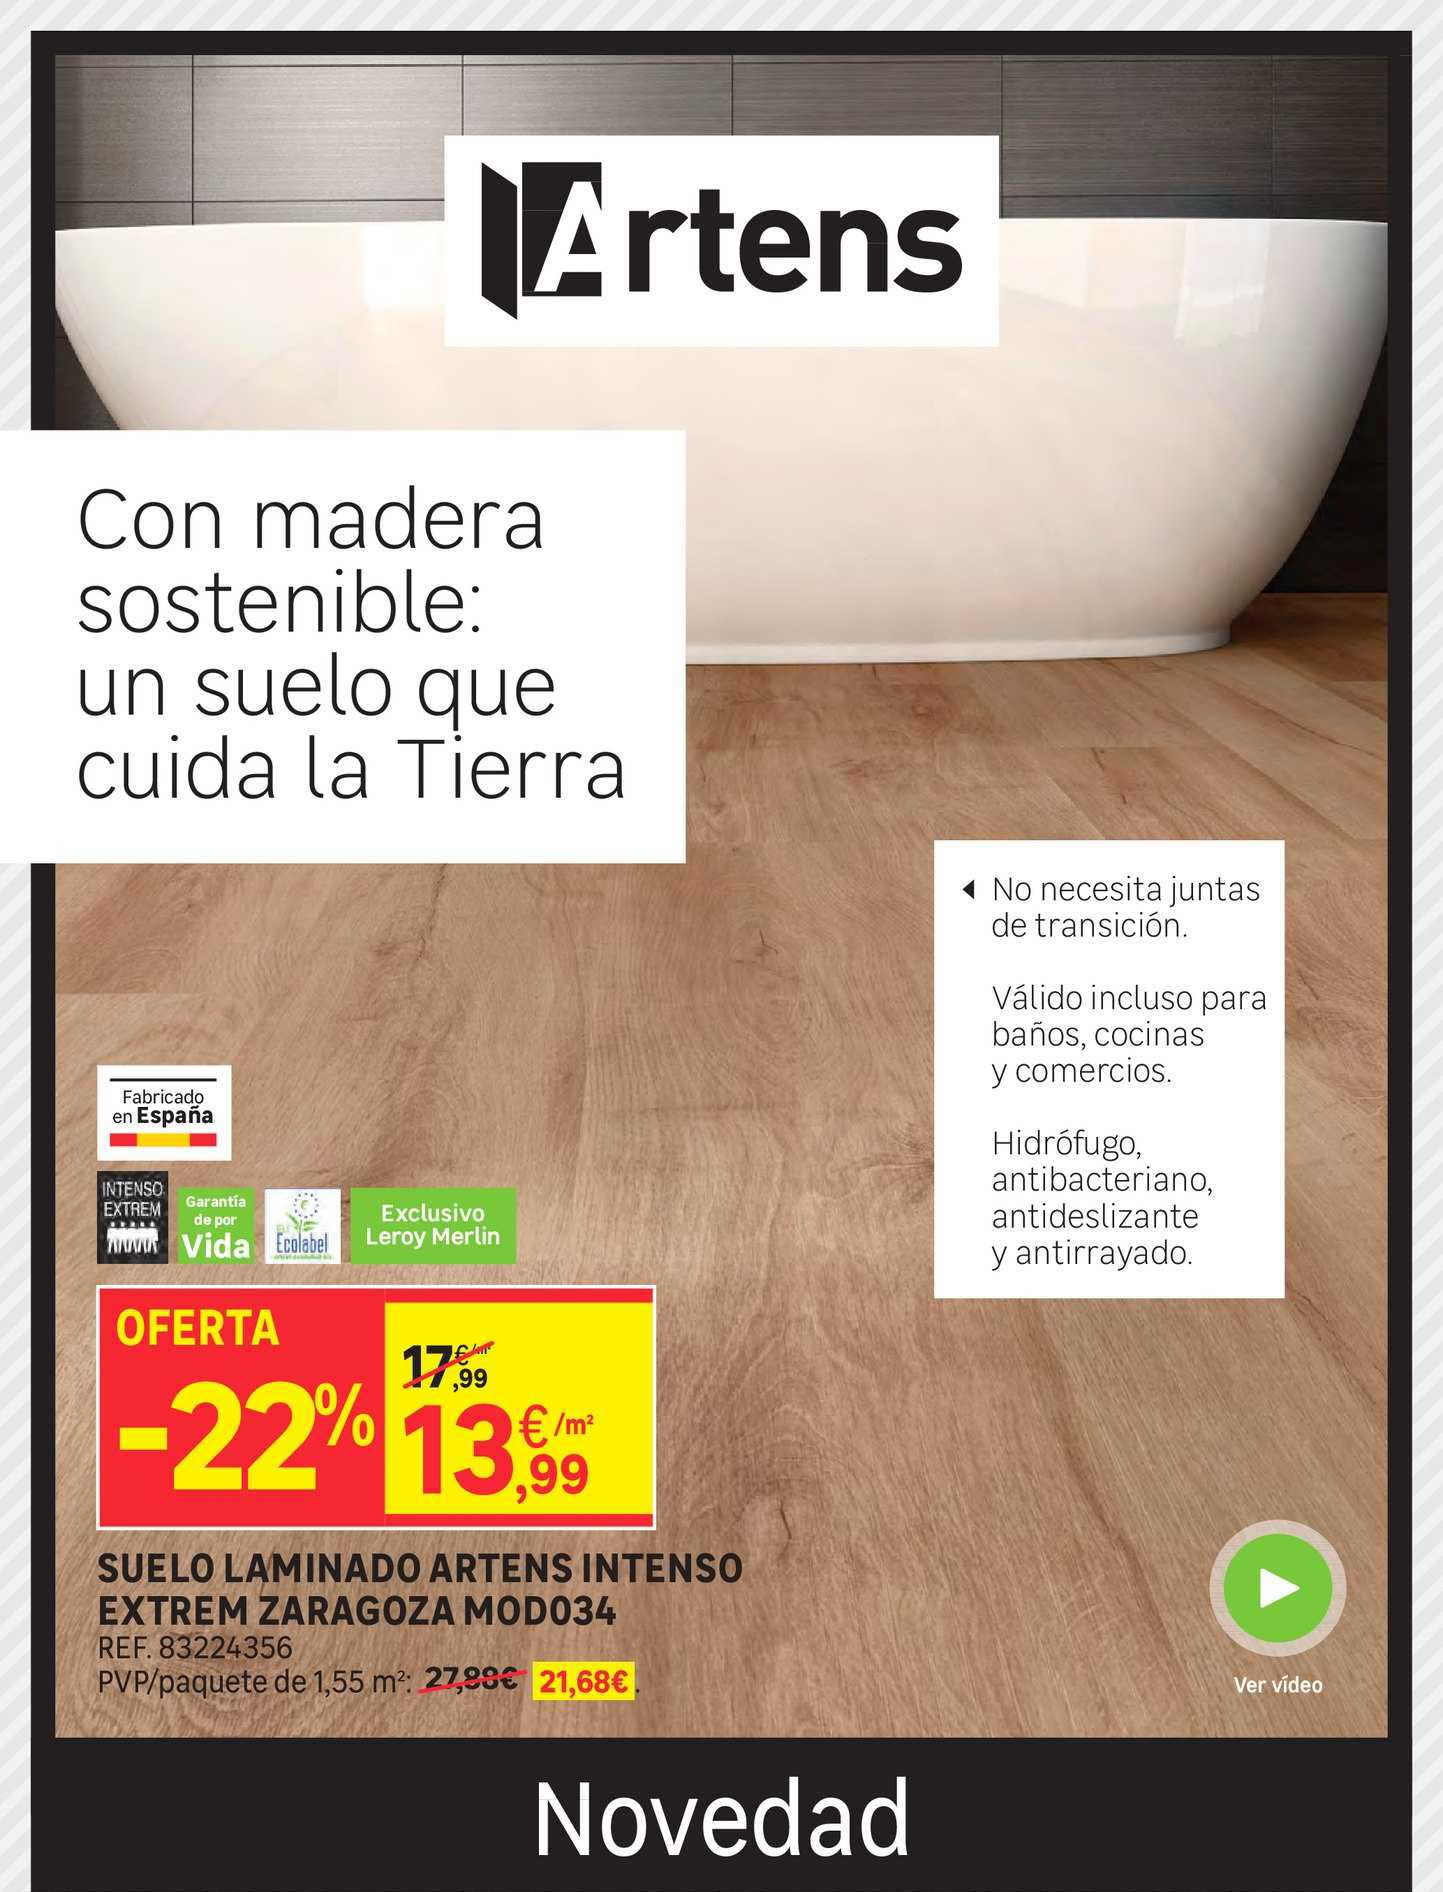 Leroy Merlin Oferta -22% Suelo Laminado Artens Intenso Extrem Zaragoza Mod034